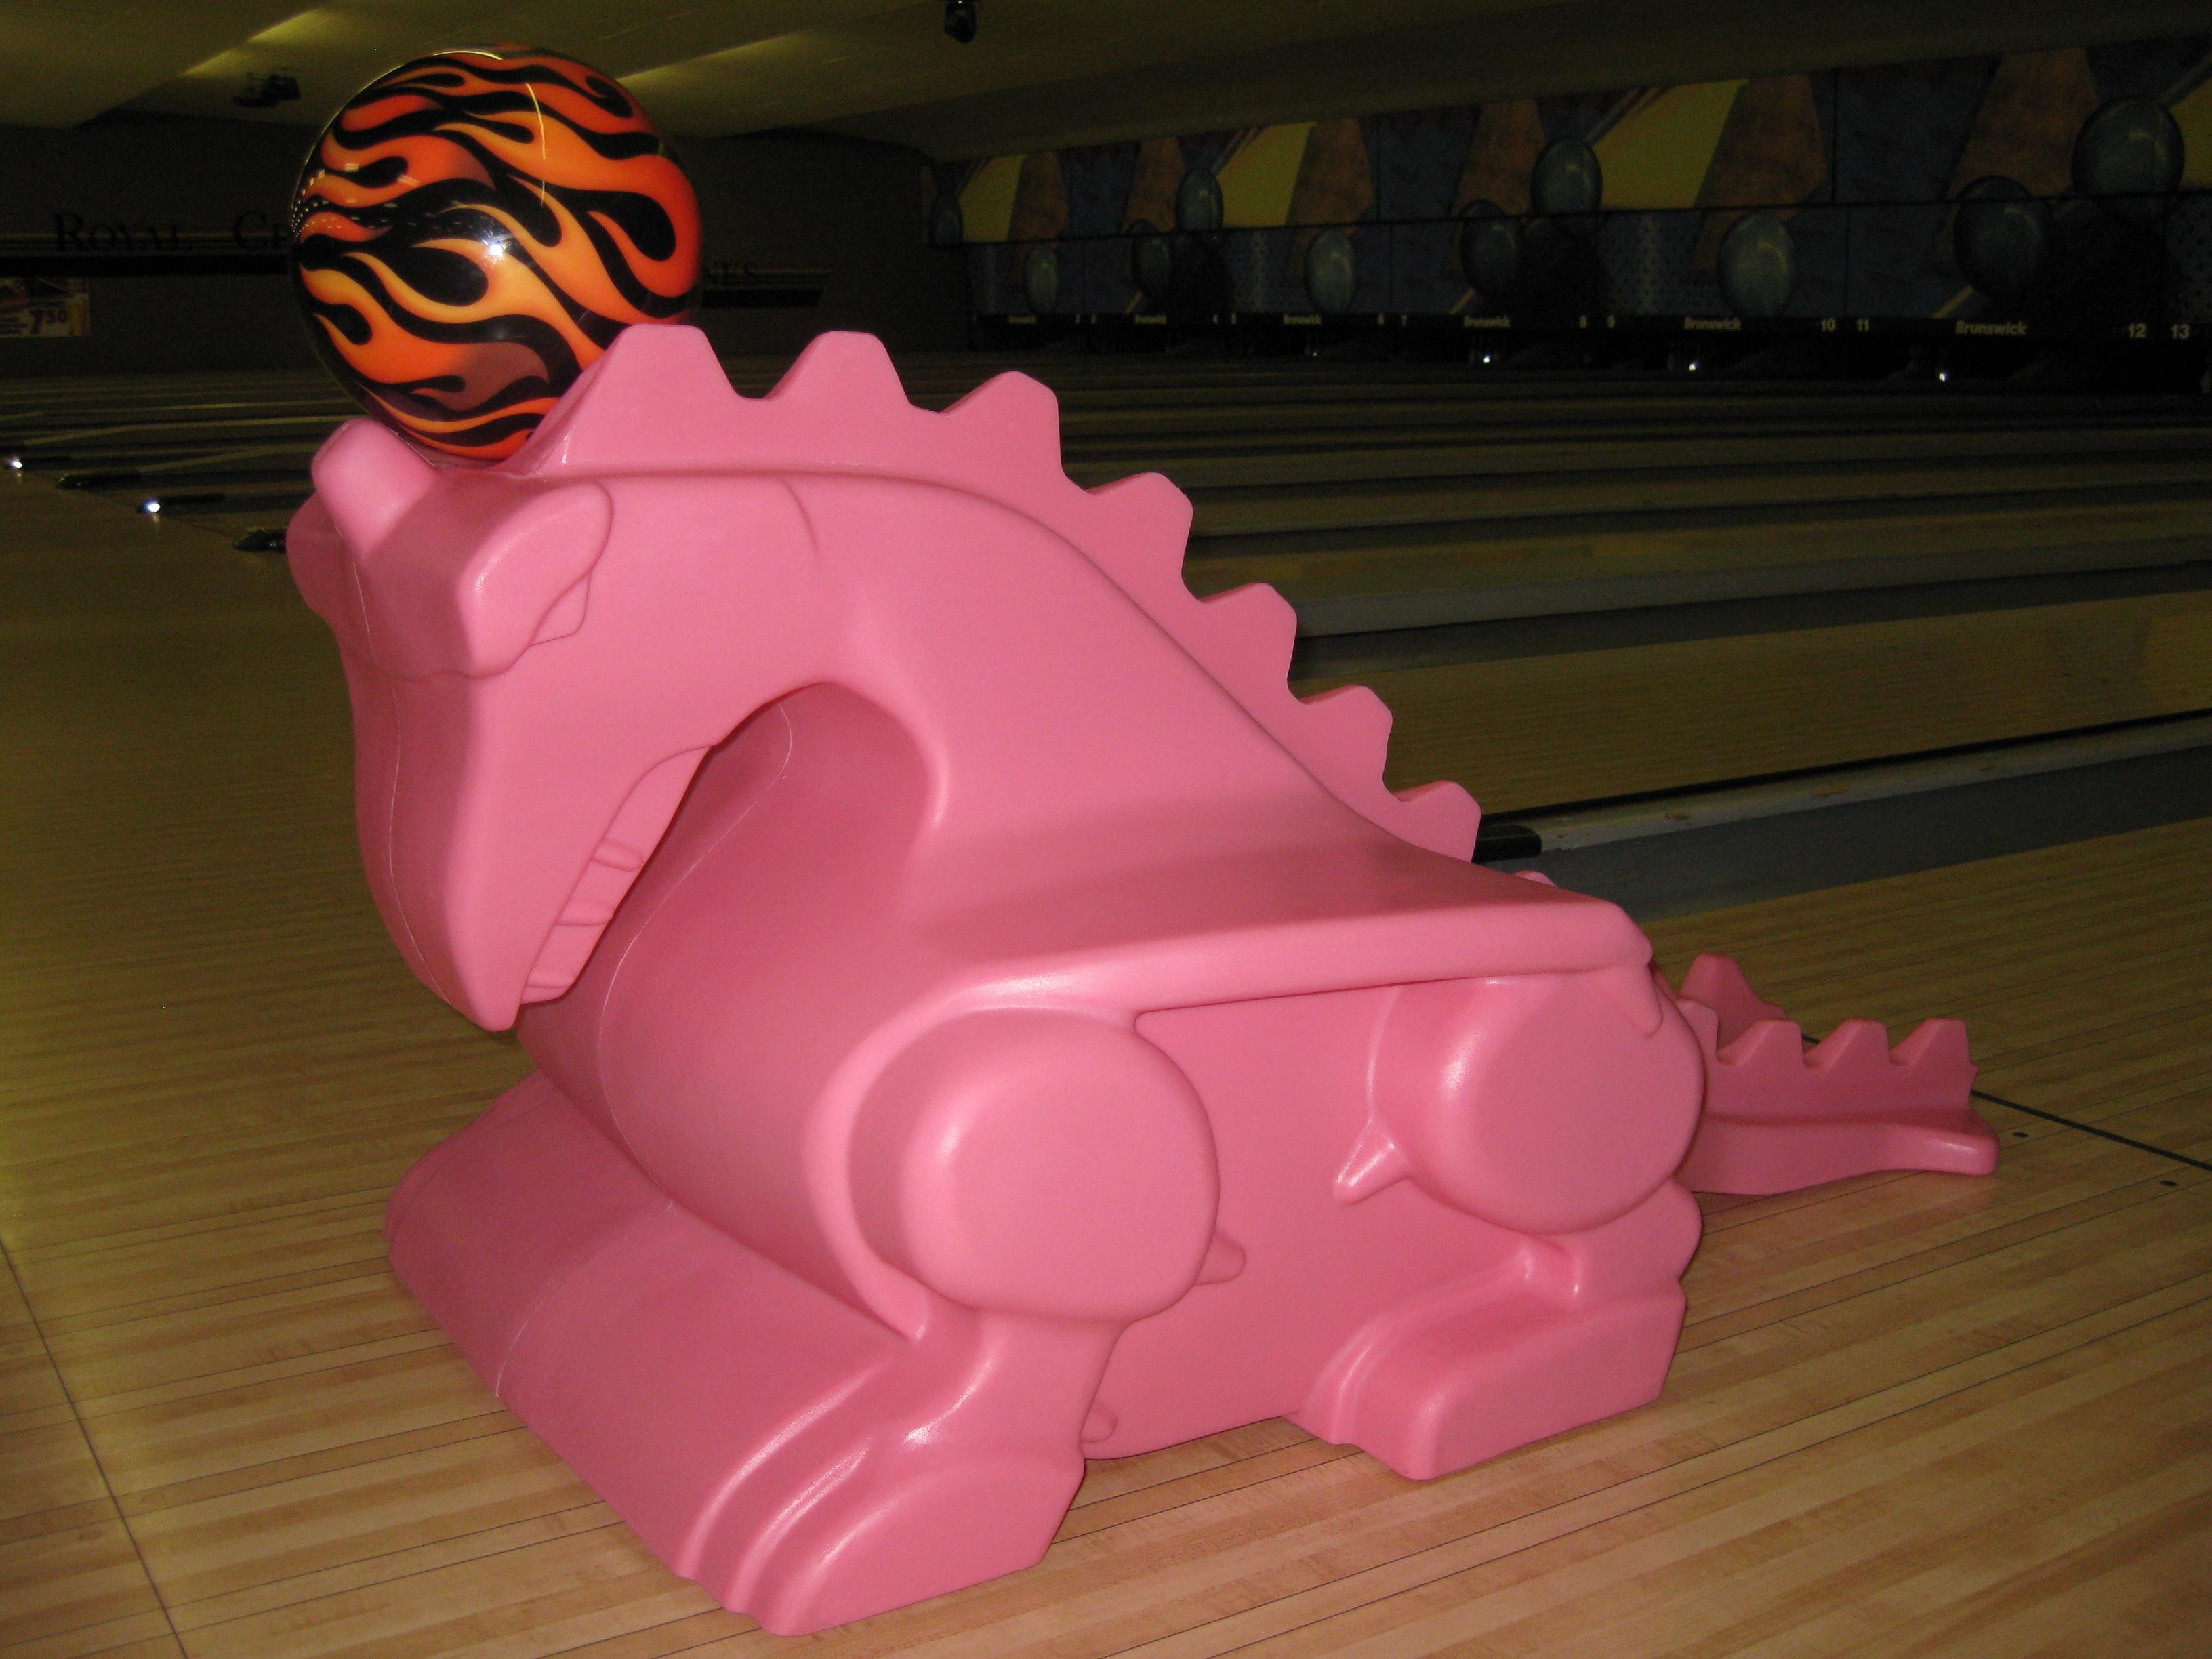 Jayhawk Bowling Supplies